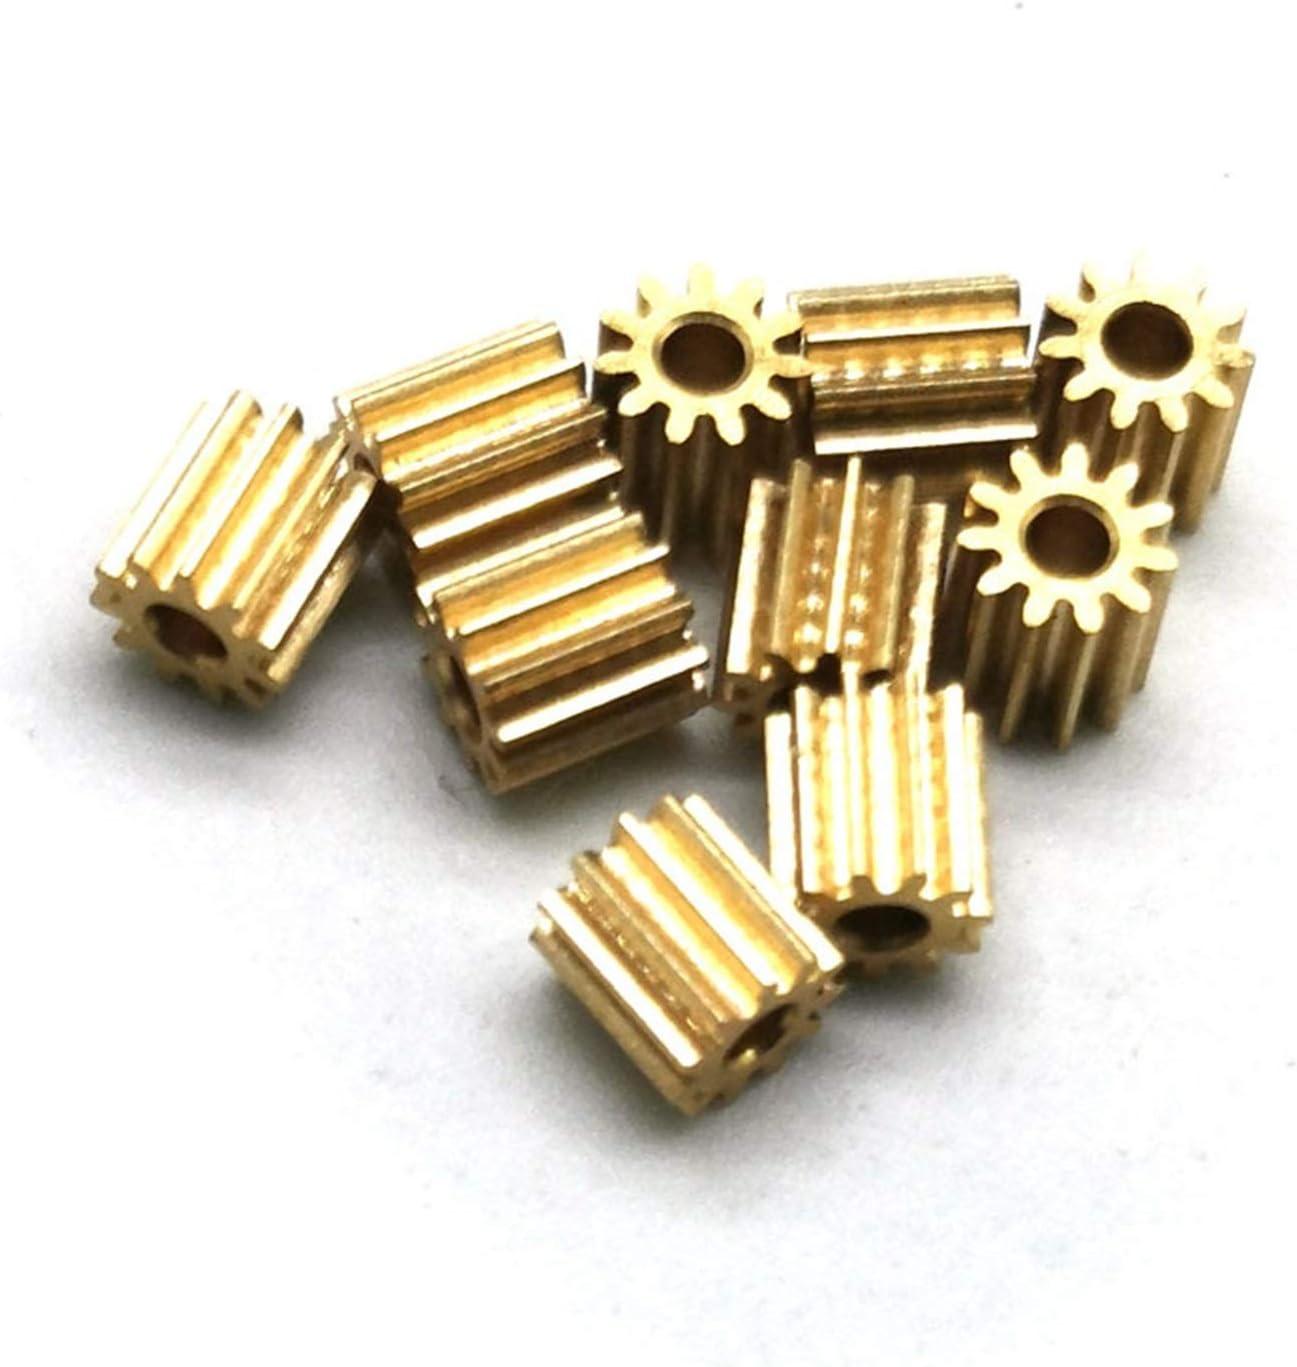 DINGGUANGHE-CUP Durable 112A 0.5M Max cheap 85% OFF Brass Gears Teeth 11 Mechanica